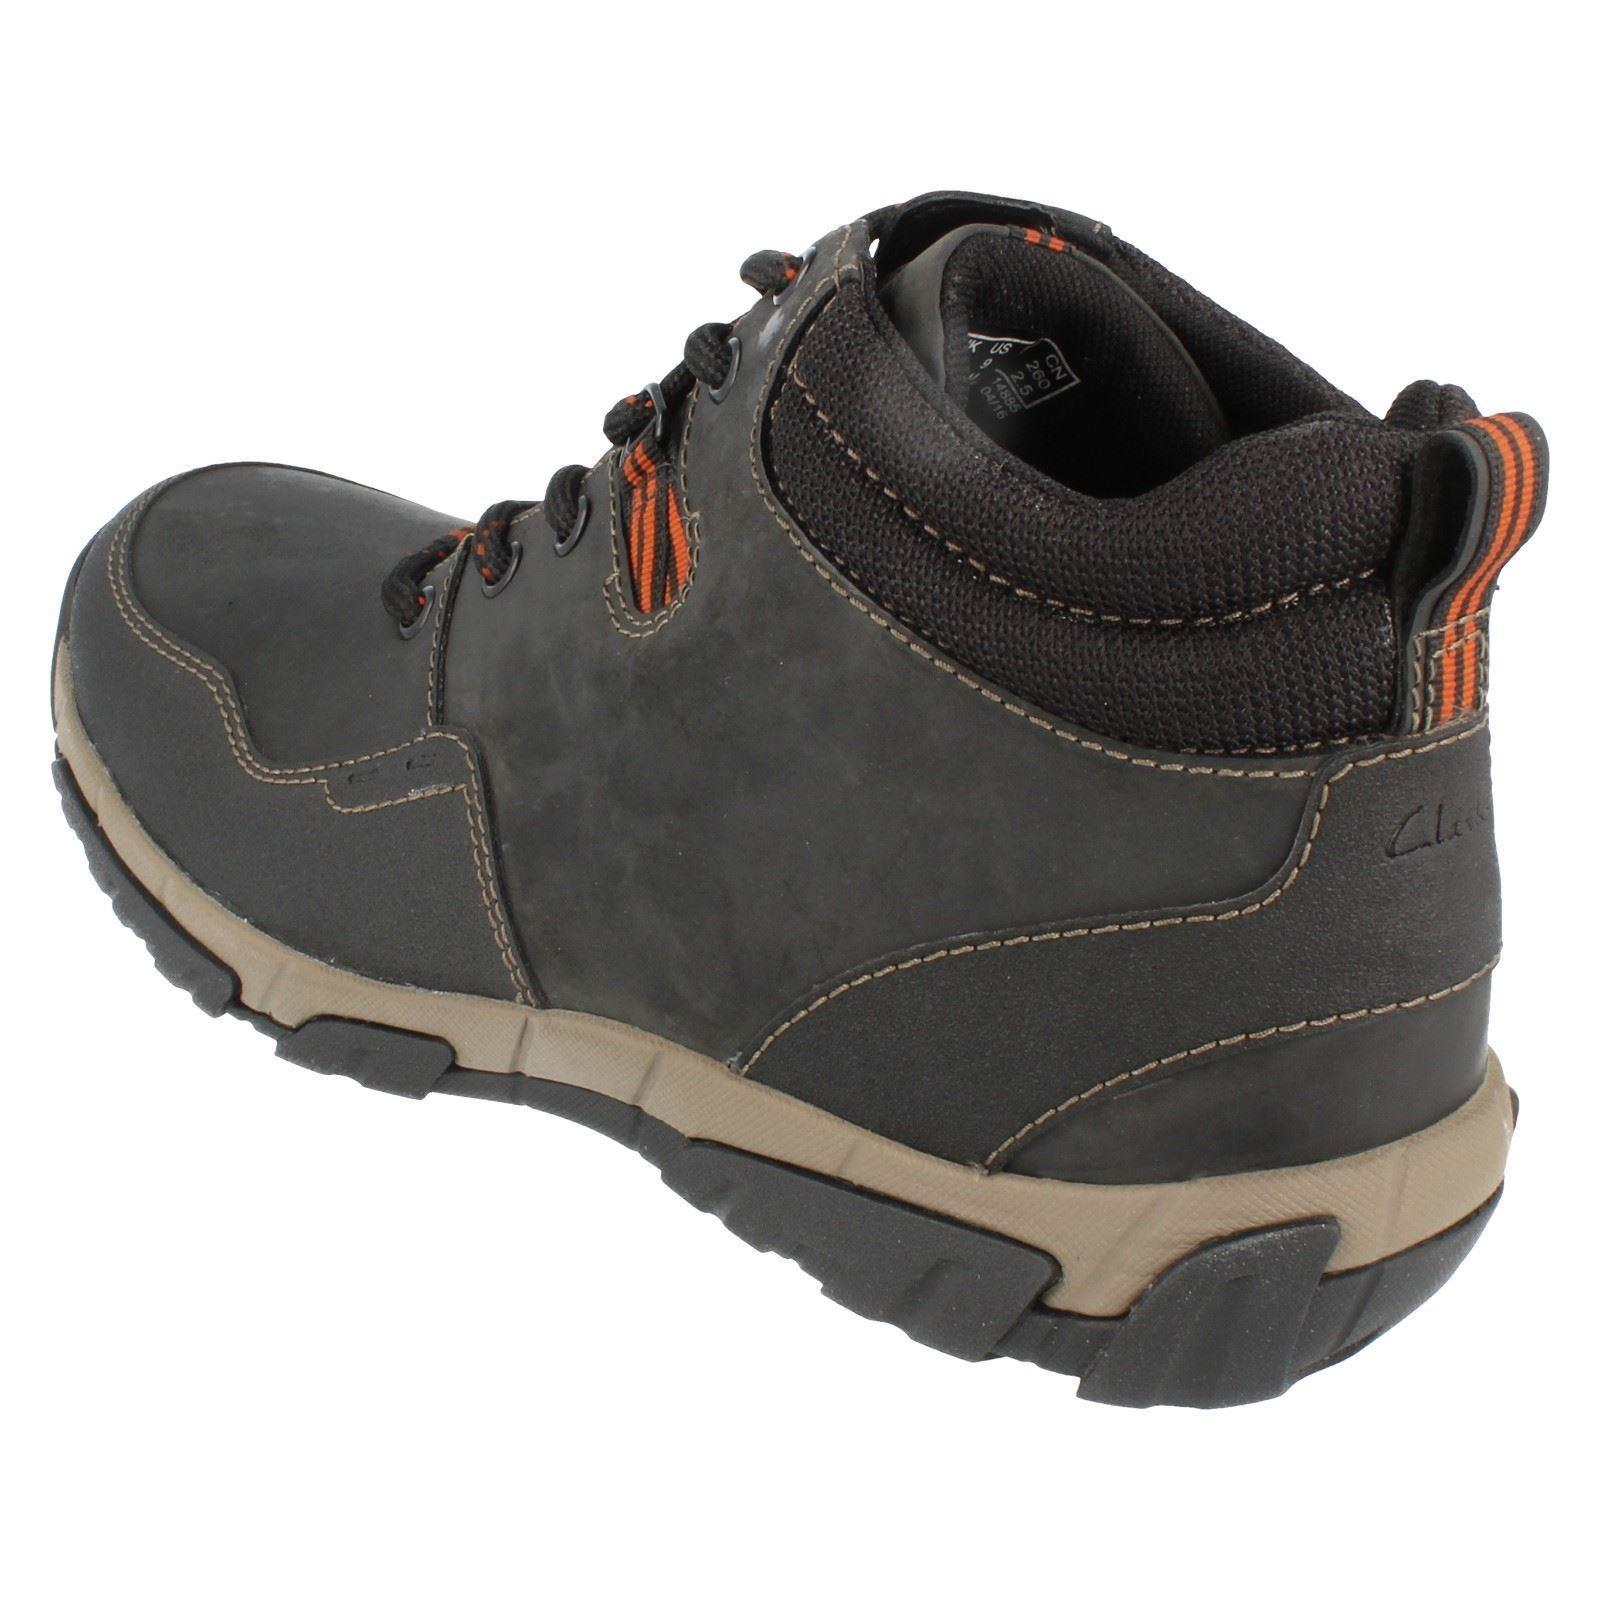 Mens Clarks Waterproof Boots Style Walbeck Top ~ N